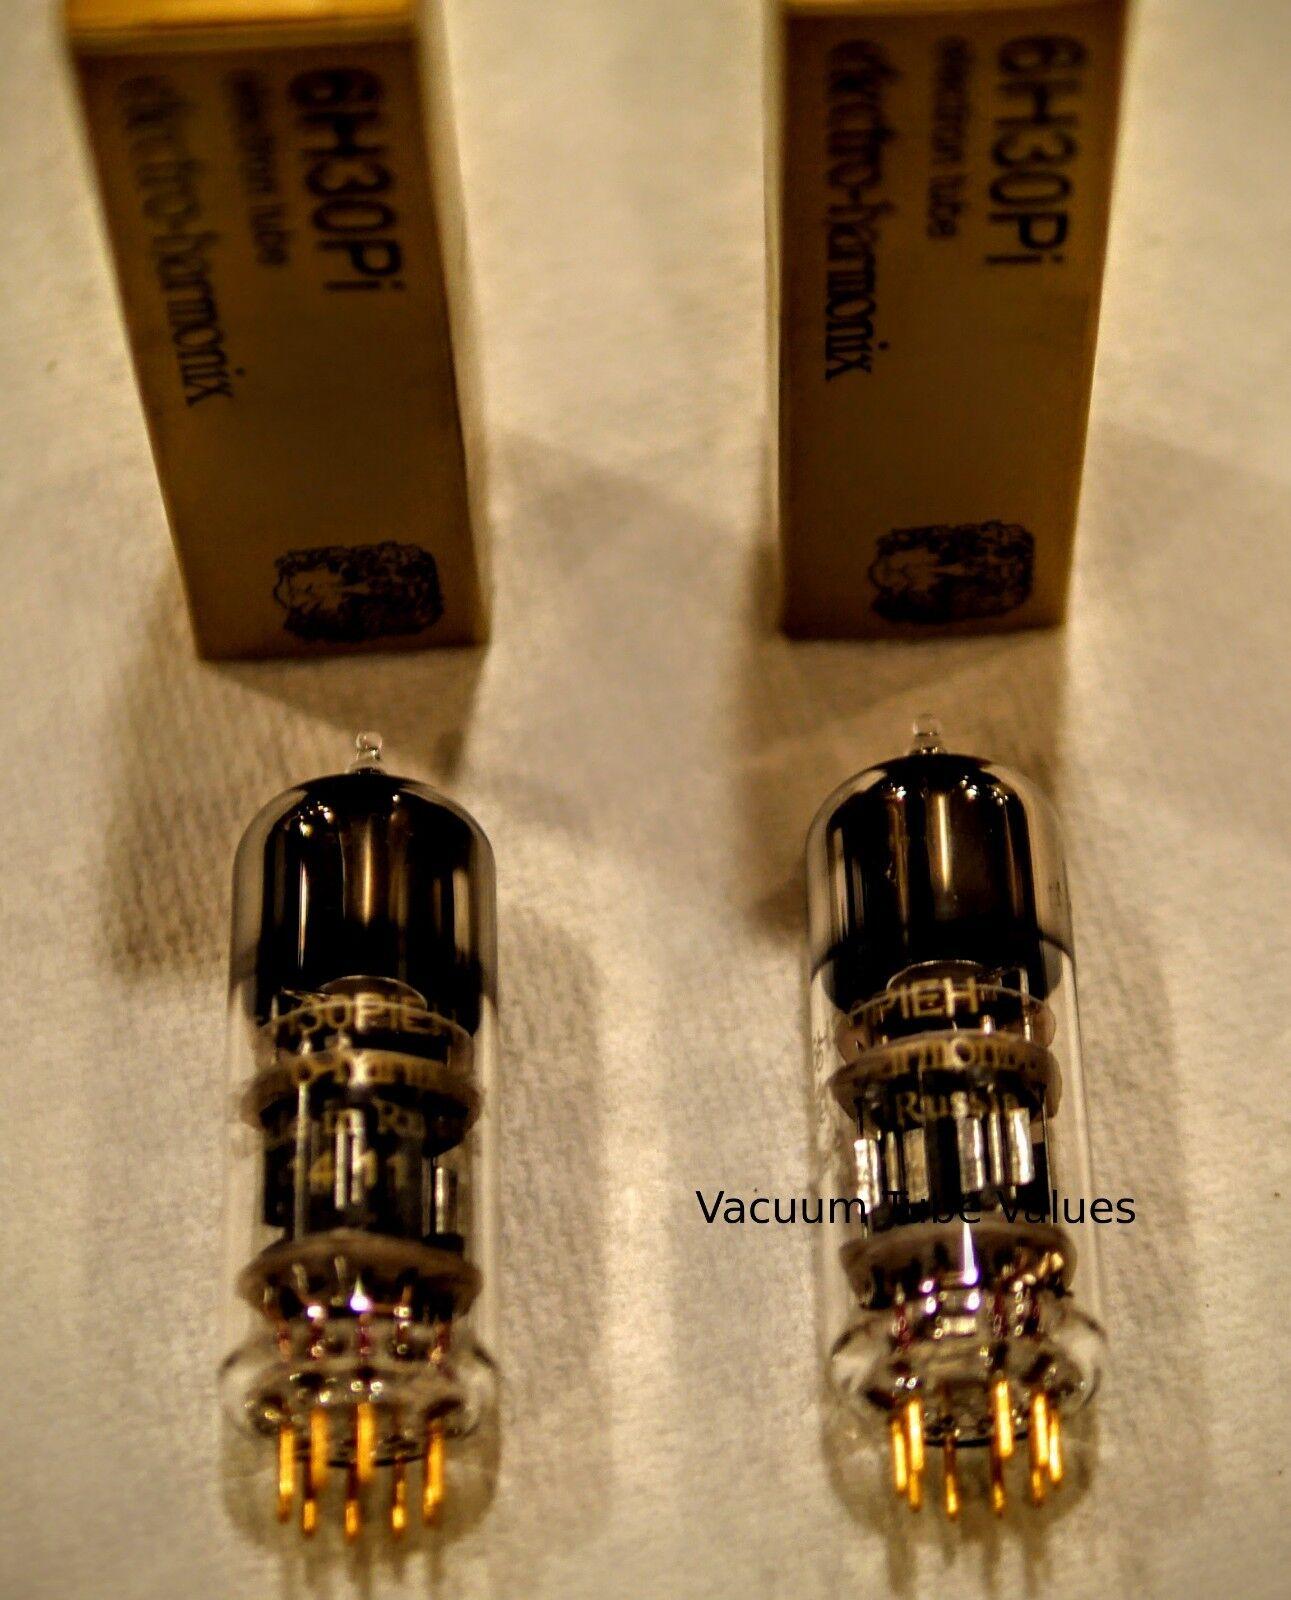 Matched Pair Electro-Harmonix 6H30Pi Gold Pins 2 tubes